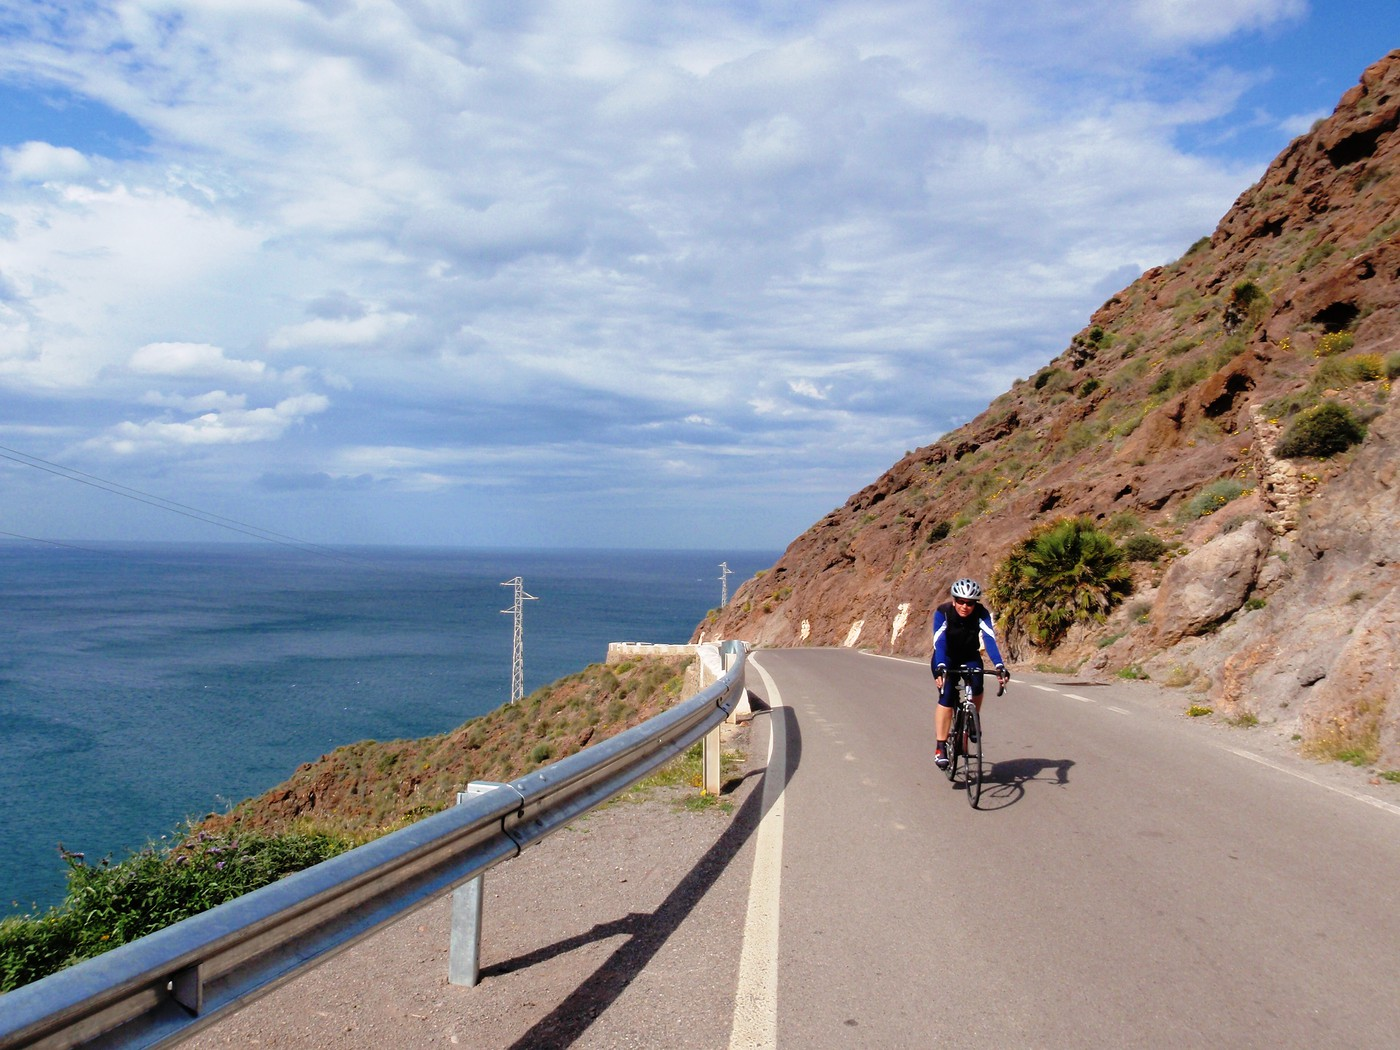 Carretera del Cerro de la Testa